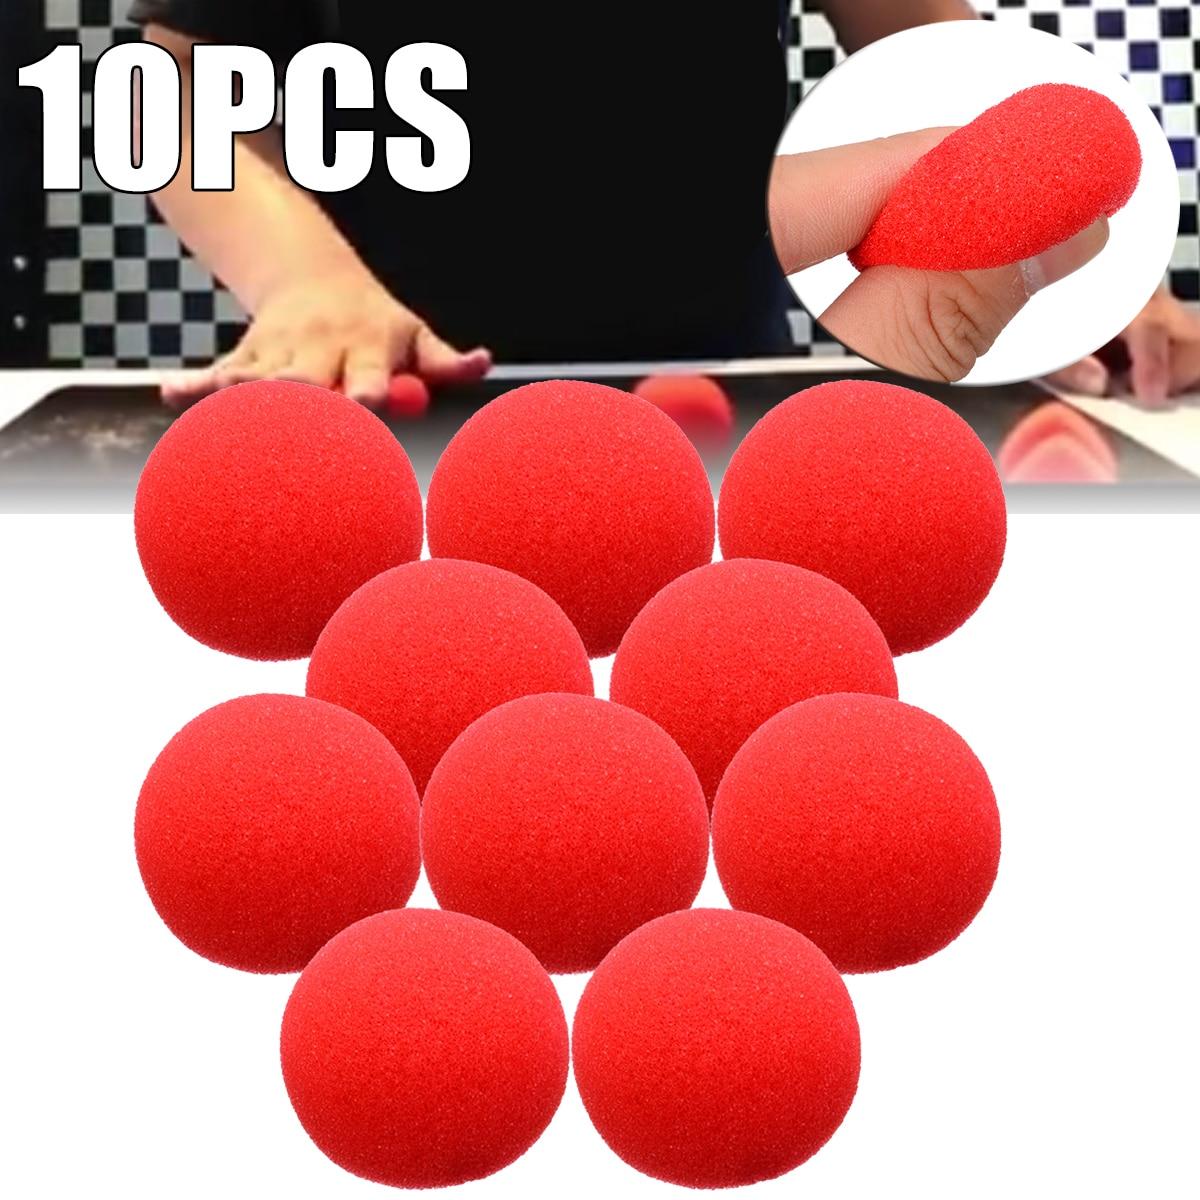 25 Tips /& Tricks Booklet Magician Tricks Clown Close Up Magic Red Sponge Balls